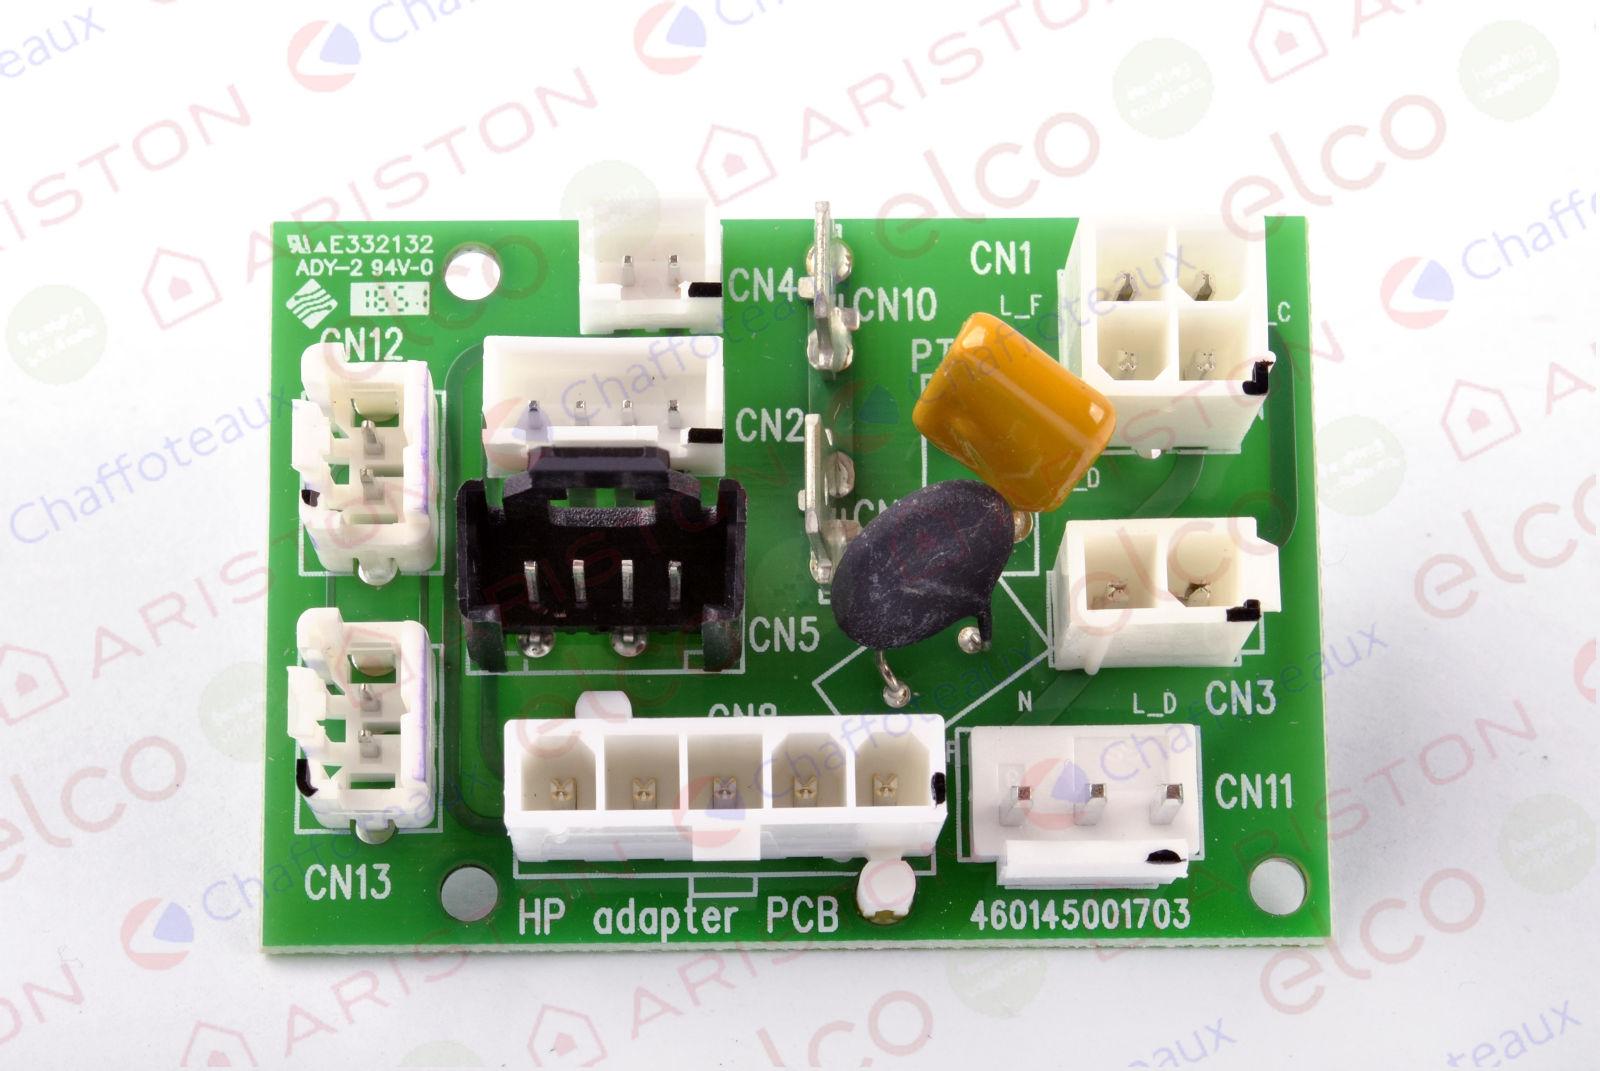 Circuito Electronico : Circuito electronico u ac